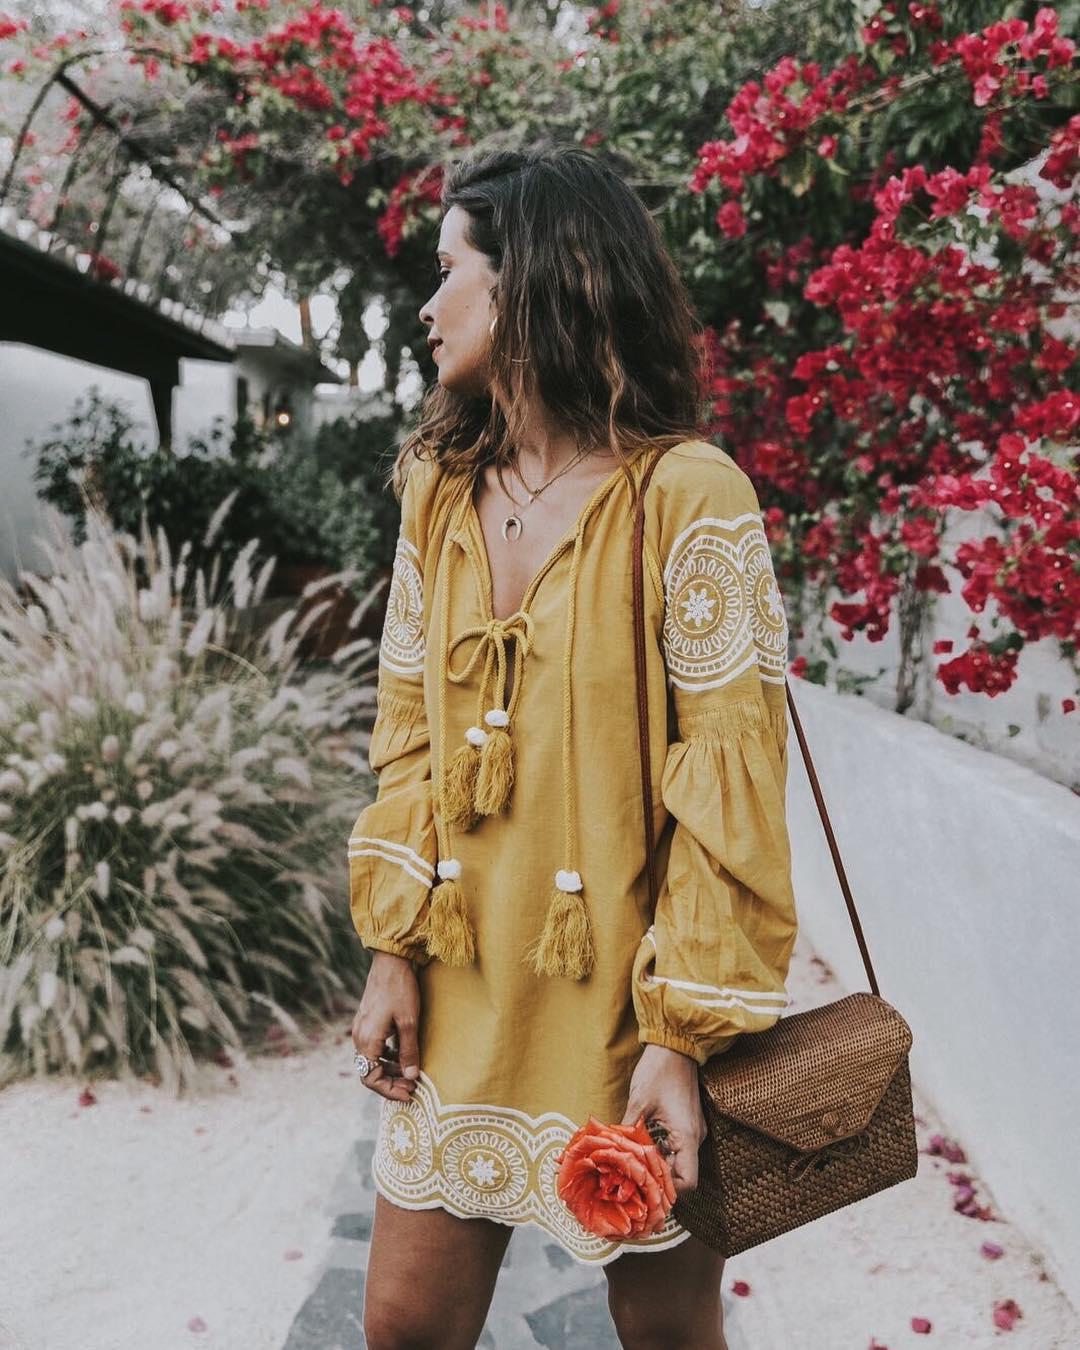 Tipsclass Fashion to night out metallic skirt, Neumann Newsvera for target